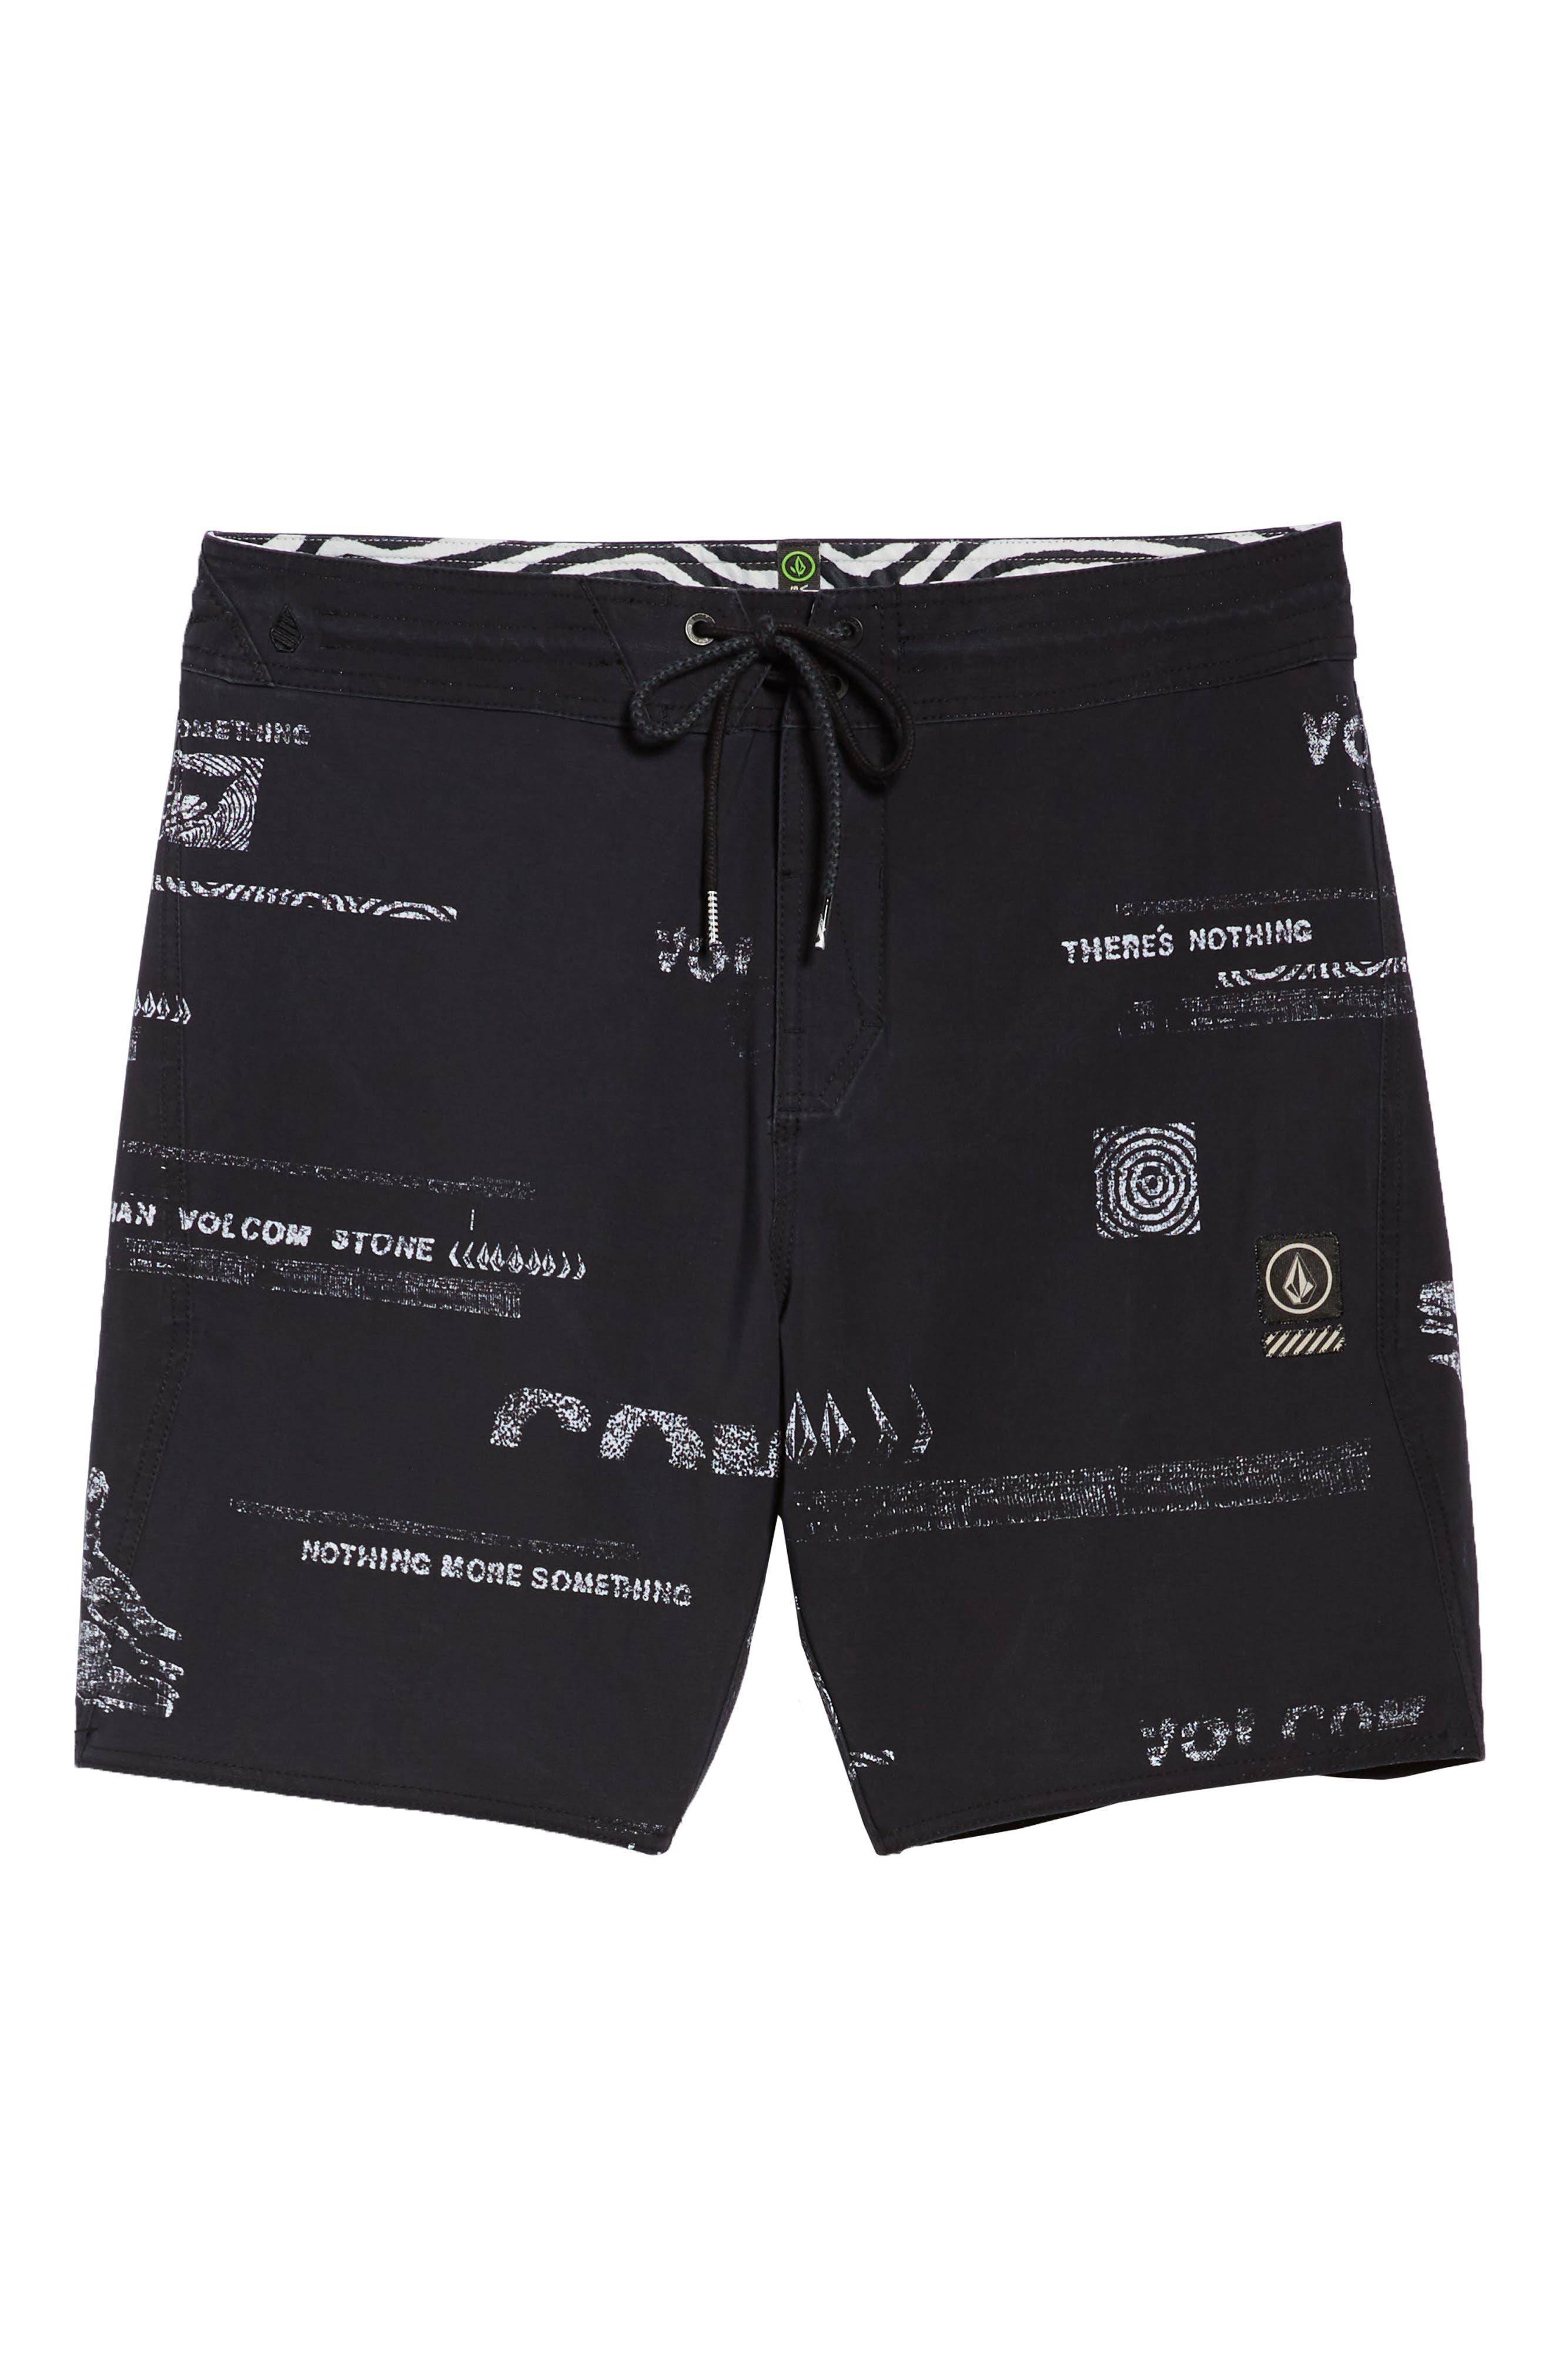 Nothing More Stoney Board Shorts,                             Alternate thumbnail 6, color,                             BLACK WHITE